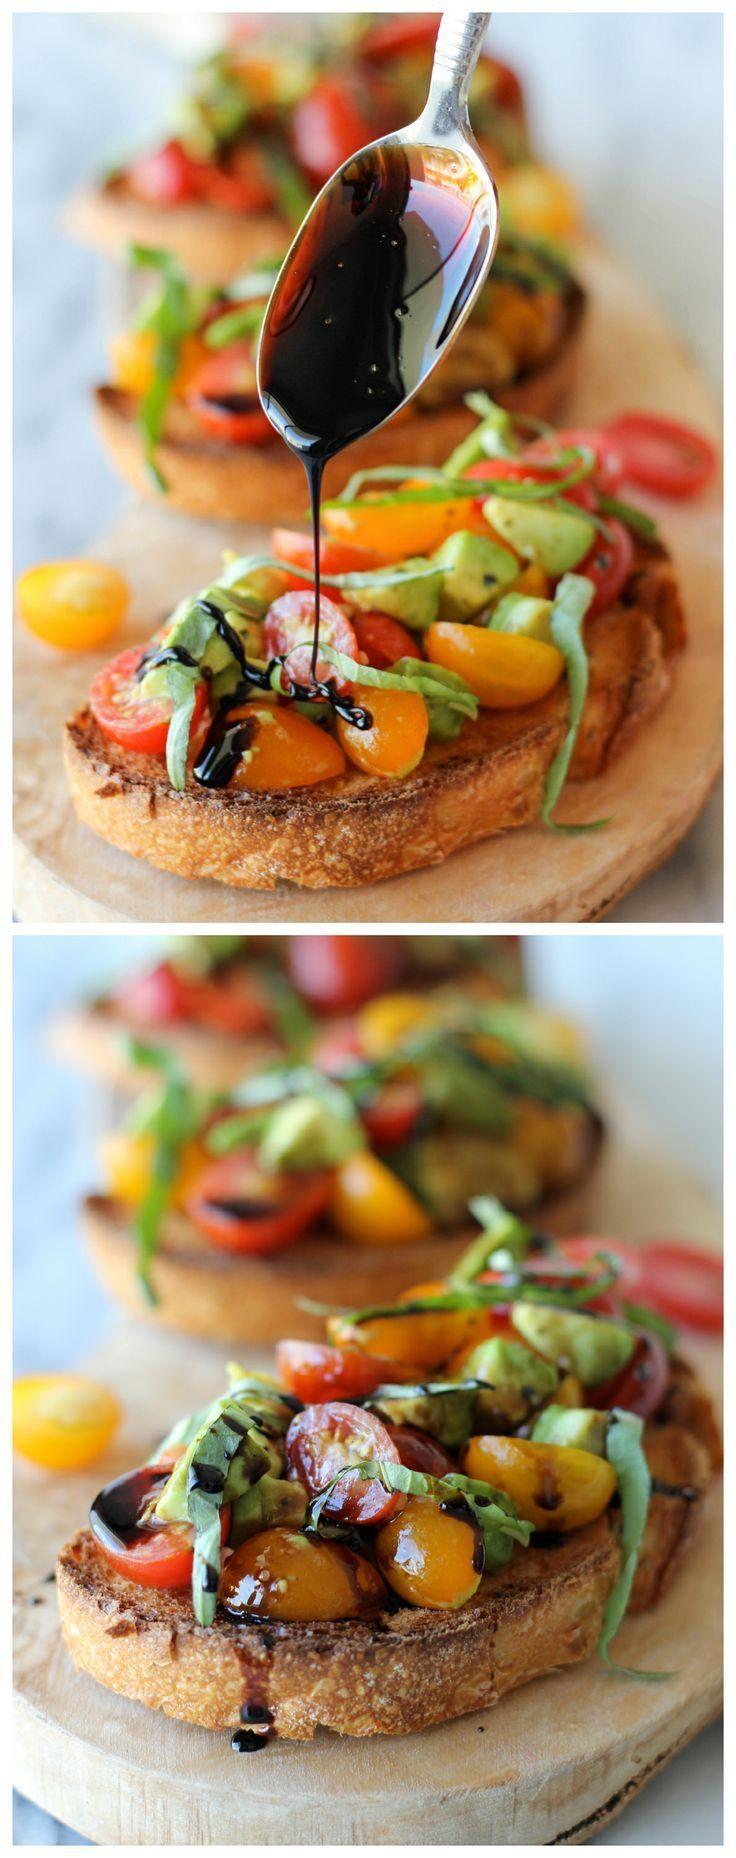 17 Best ideas about Ripe Avocado on Pinterest   Avocado ...